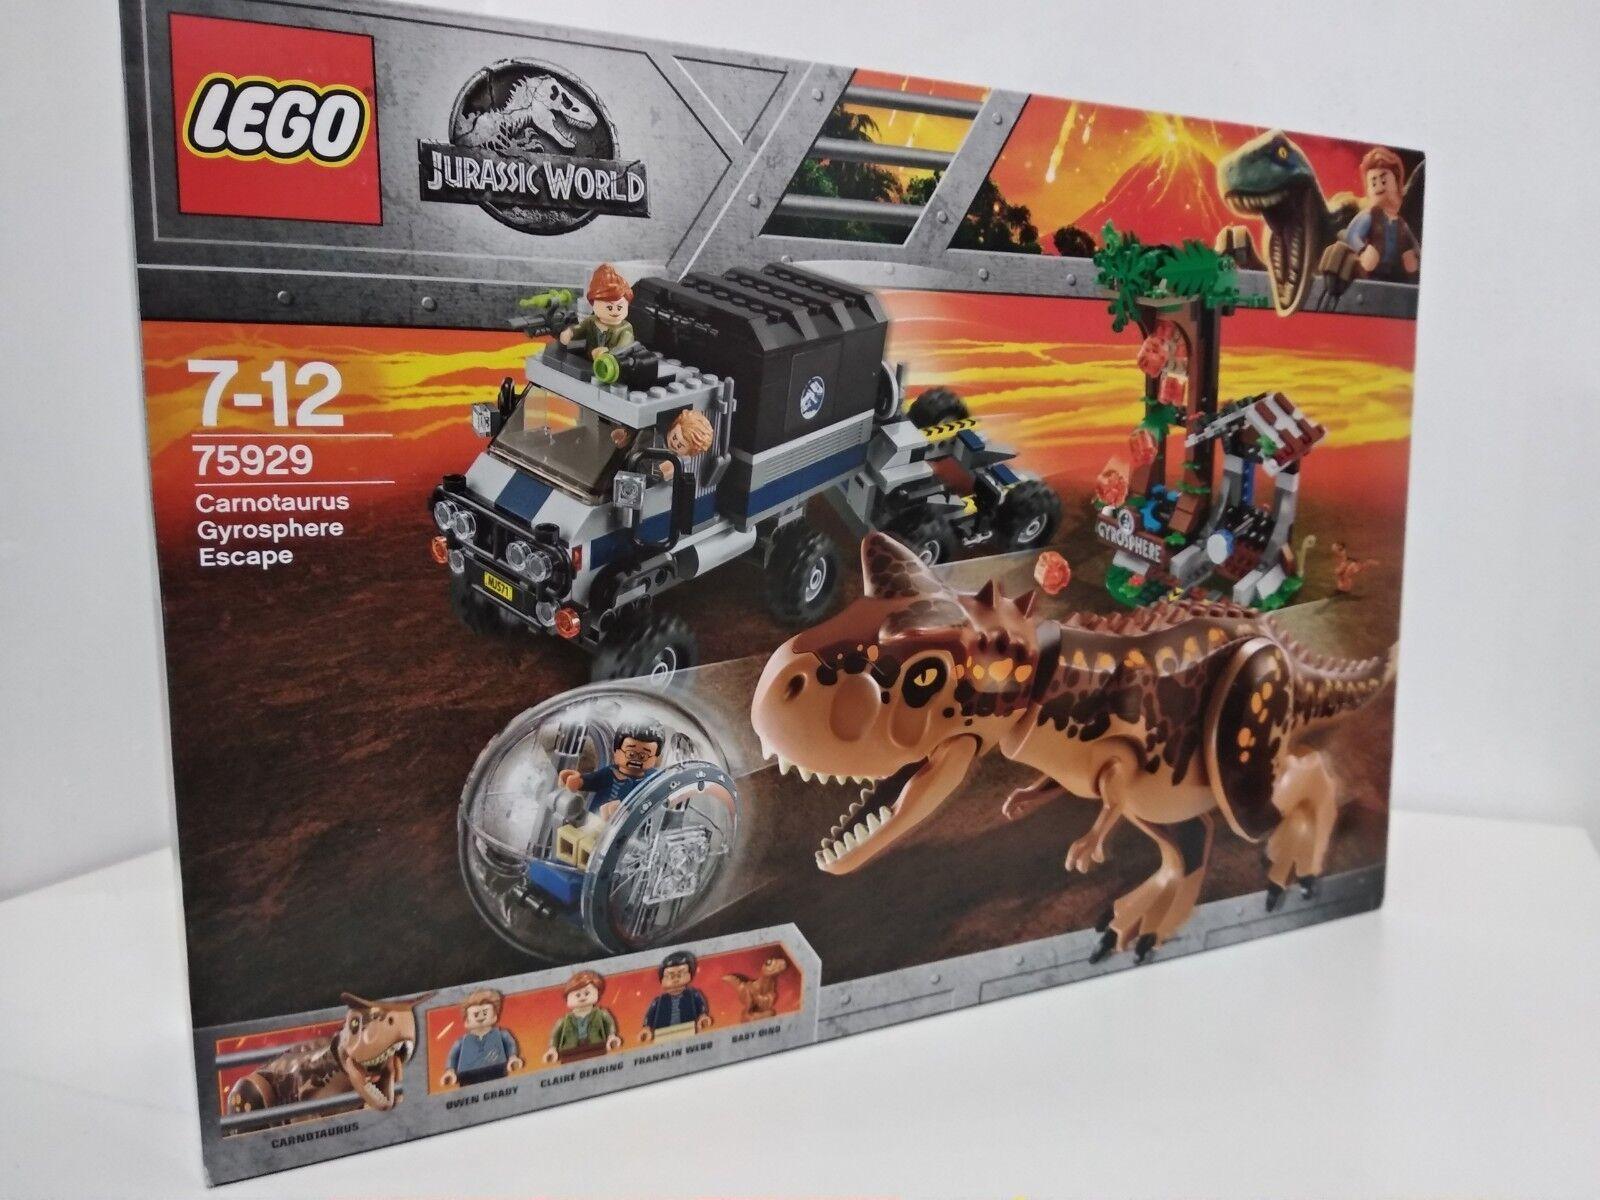 Lego  Jurassic World voiturenotaurus gyrosphere Escape 2018 (75929) non ouvert  grande remise